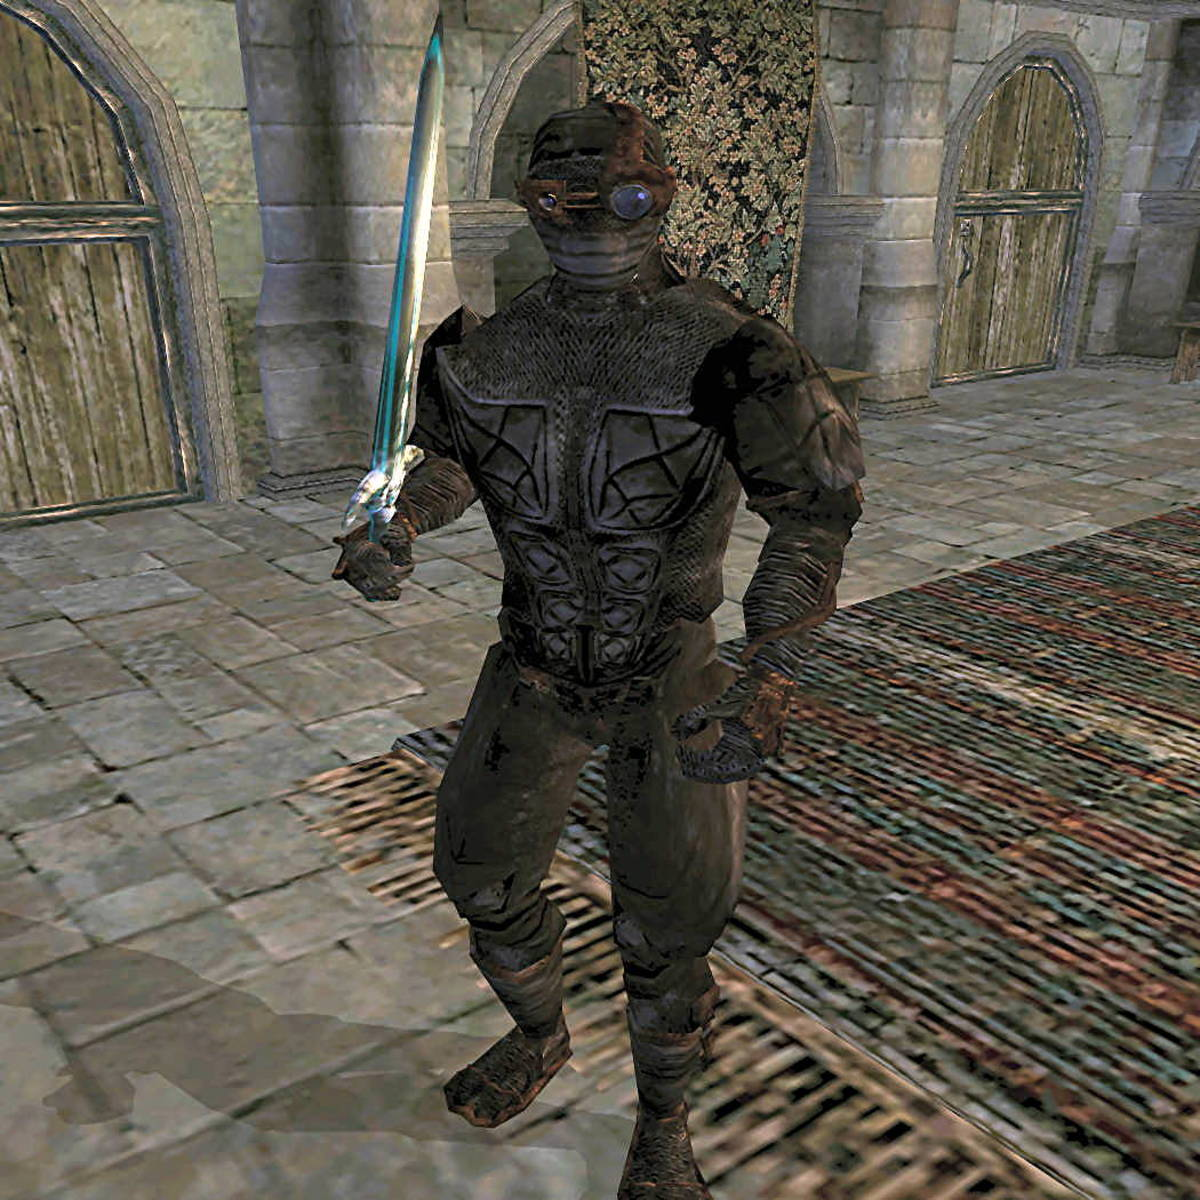 skyrim the dark brotherhood main questline walkthrough